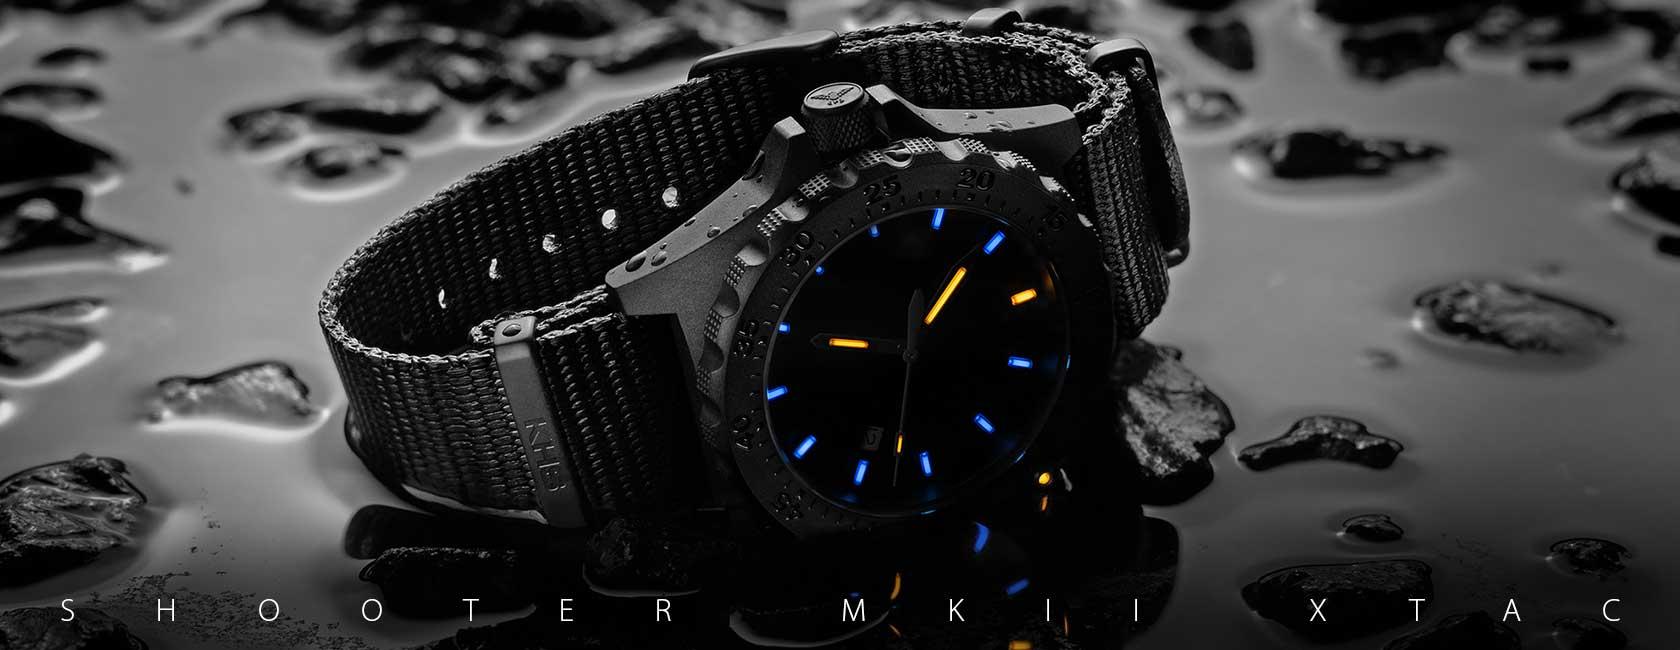 Shooter MKII XTAC